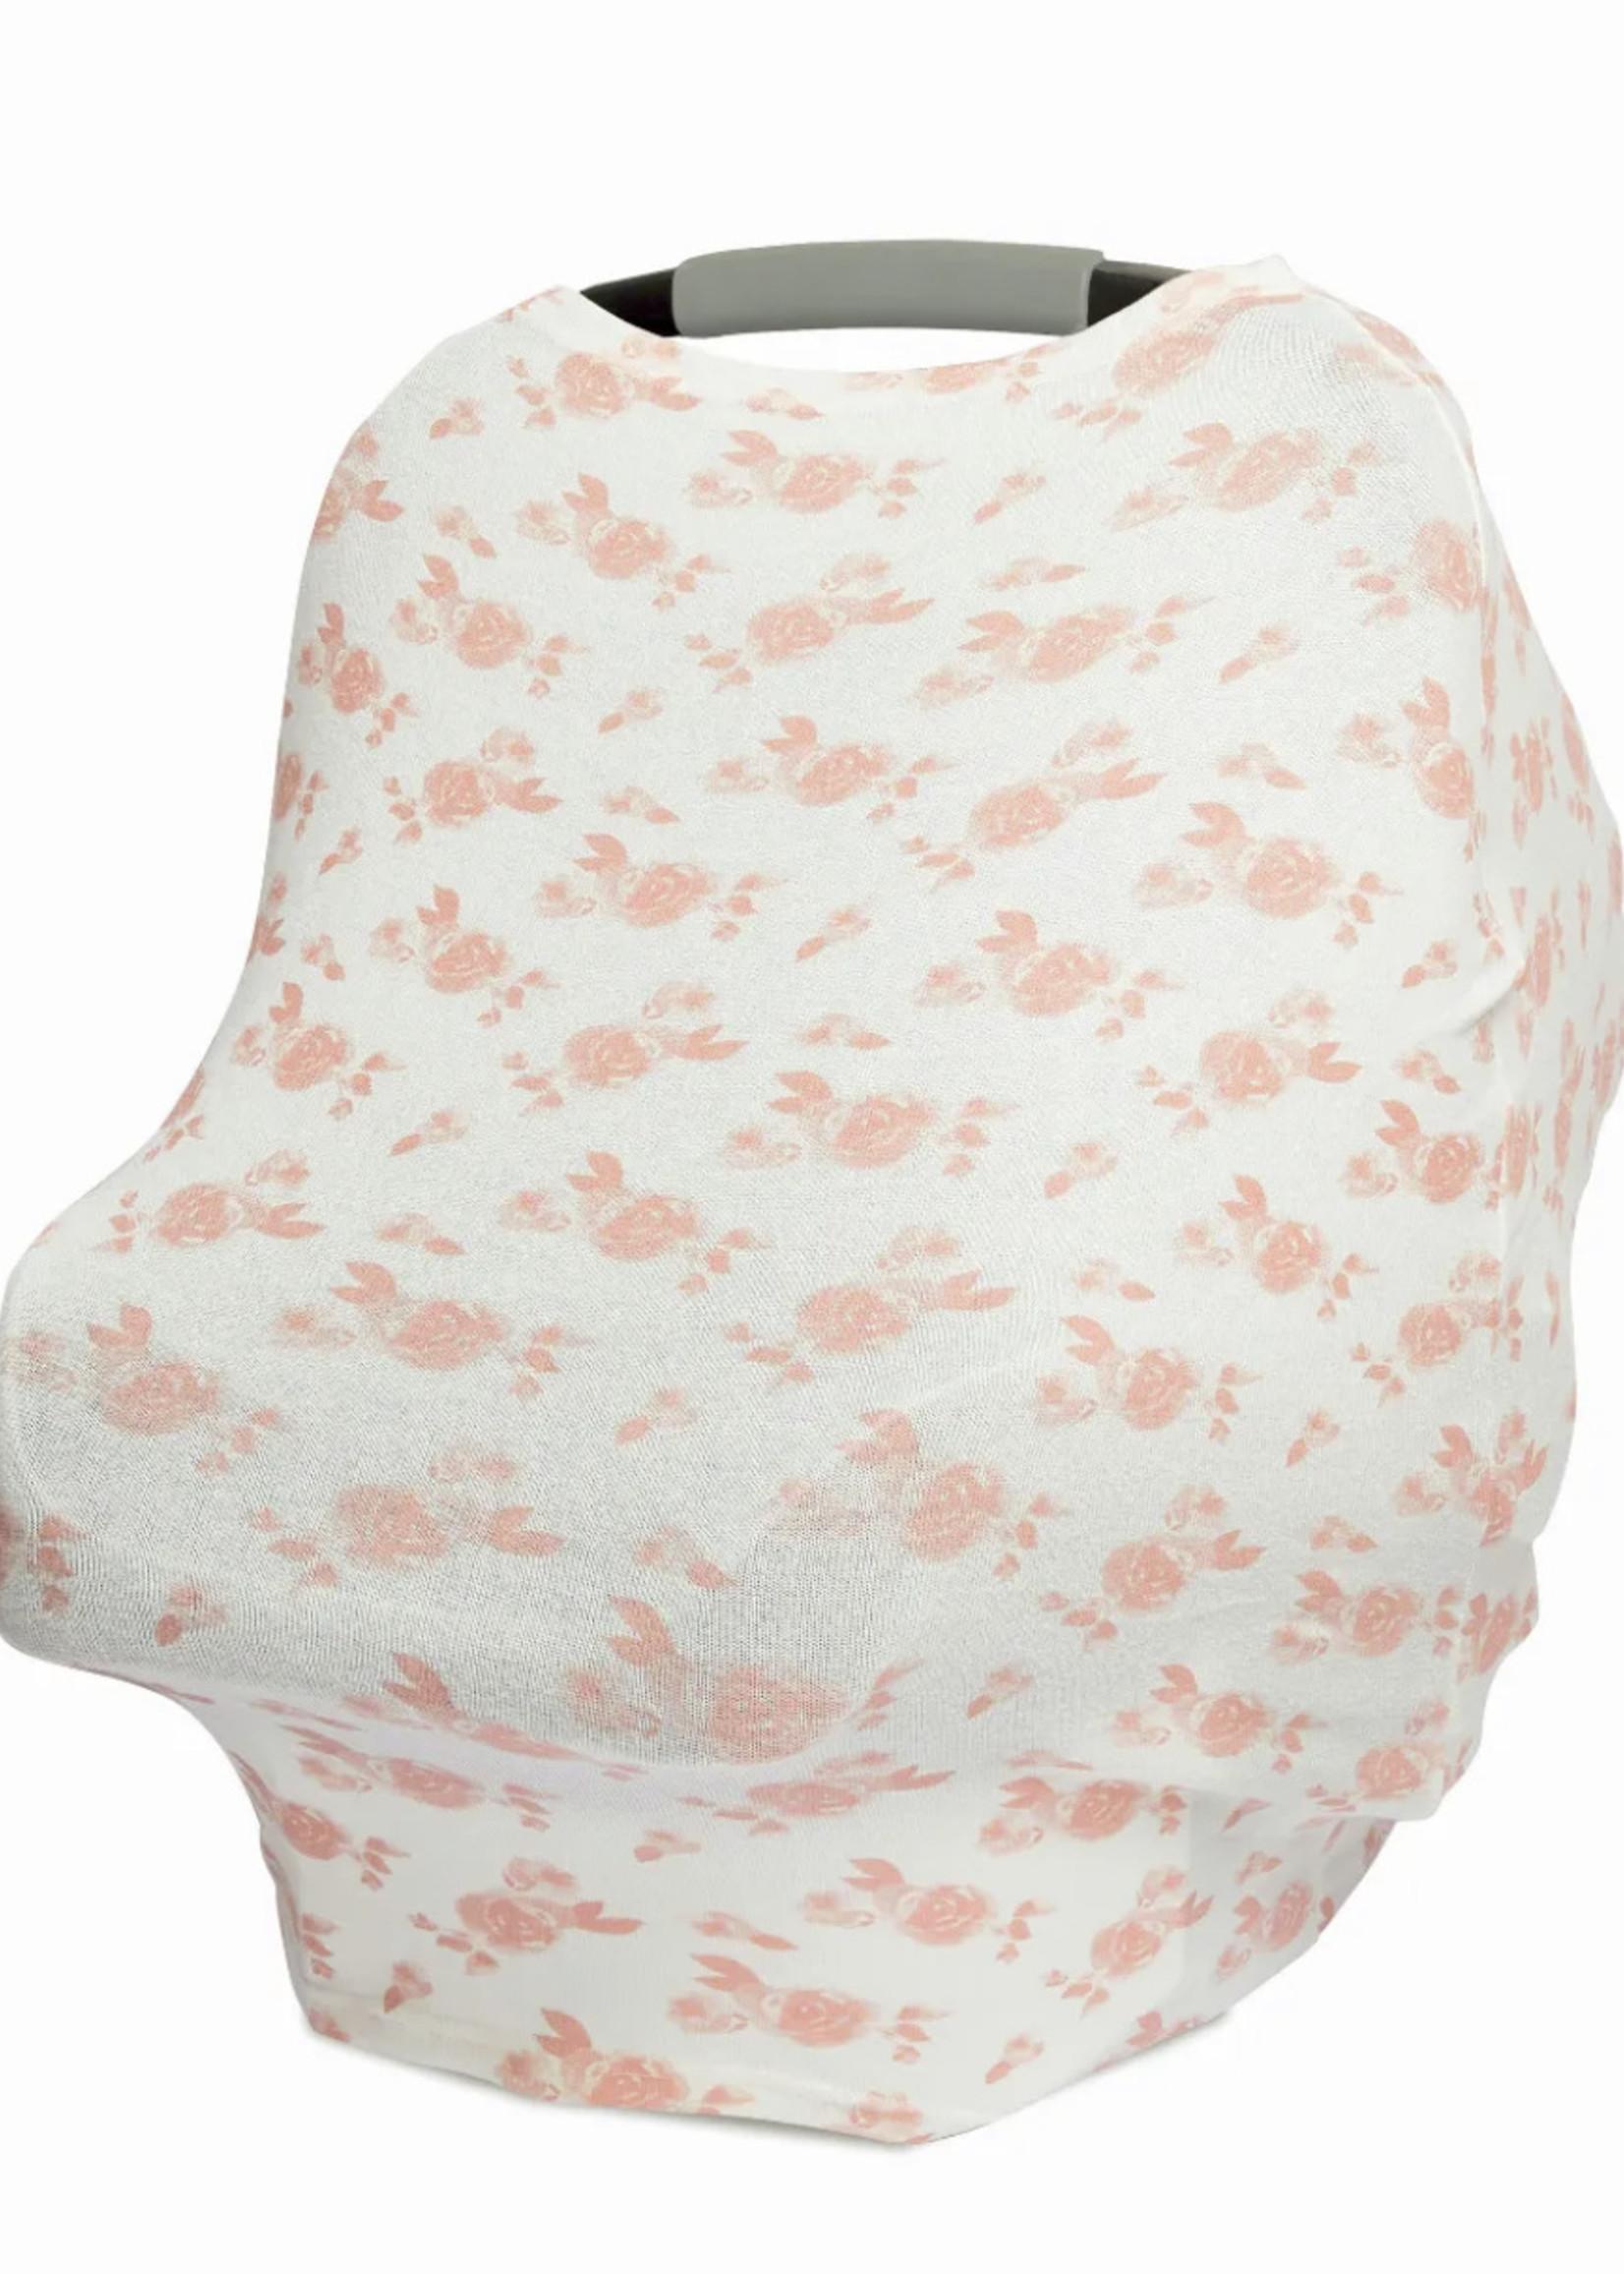 Elitaire Petite Rosettes Snuggle Knit Multi Use Cover